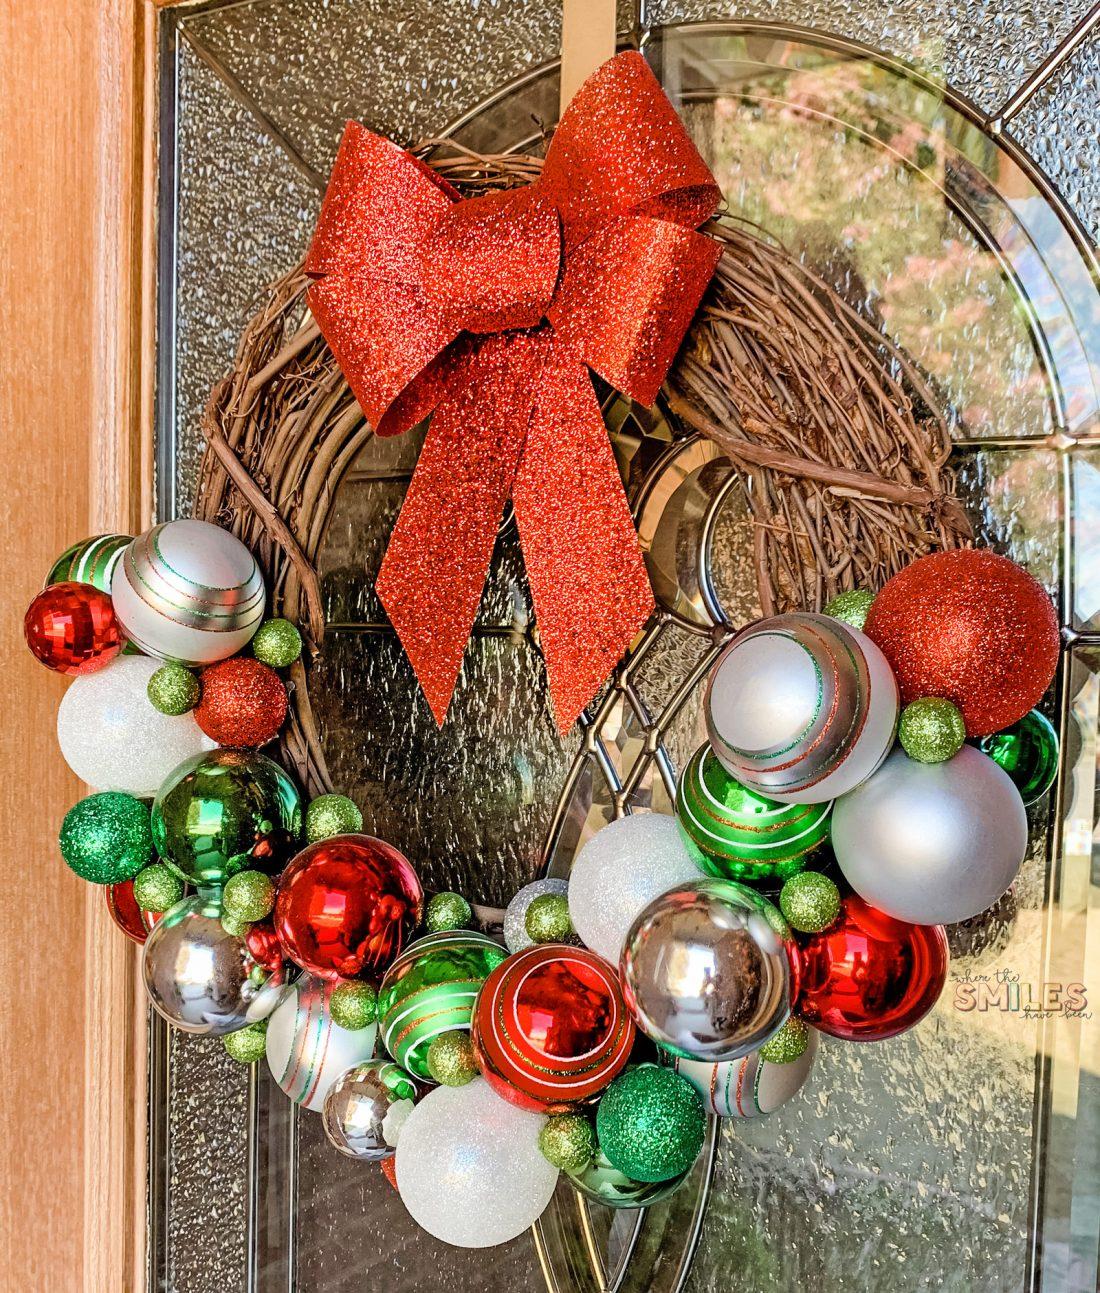 DIY Christmas Ornament Wreath: Rustic Meets Refined!